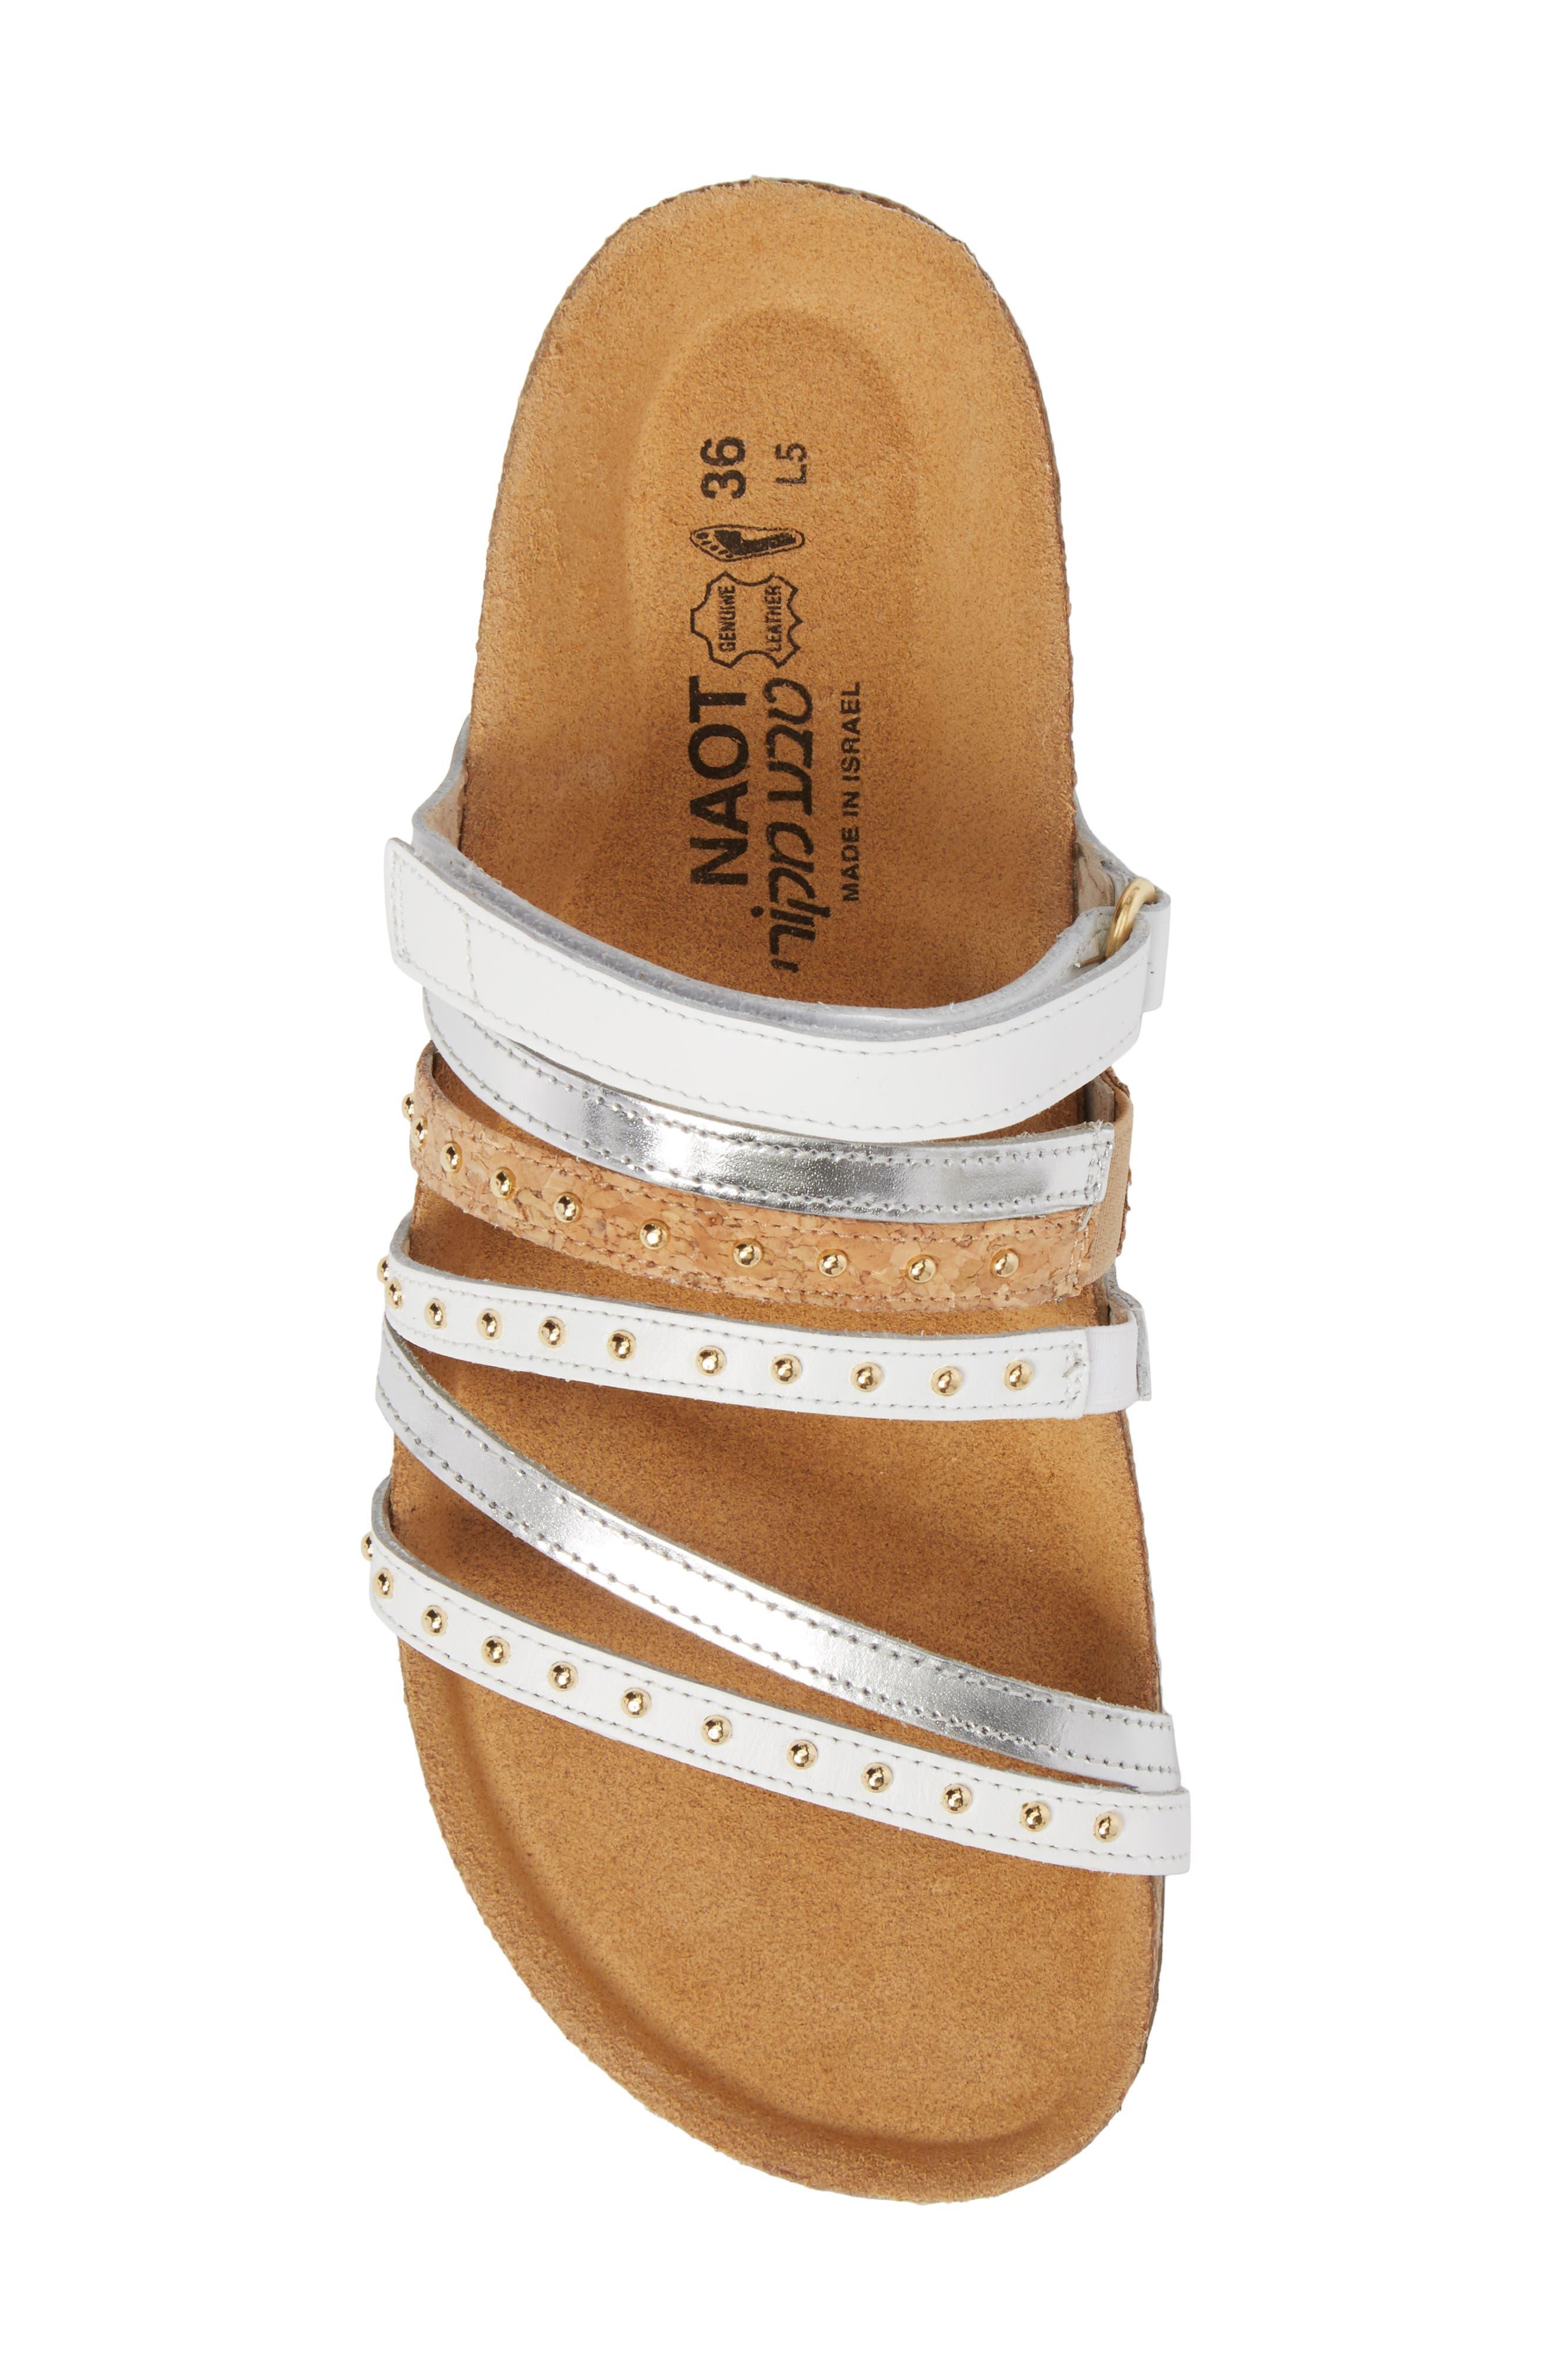 Prescott Sandal,                             Alternate thumbnail 5, color,                             White/ Silver Leather